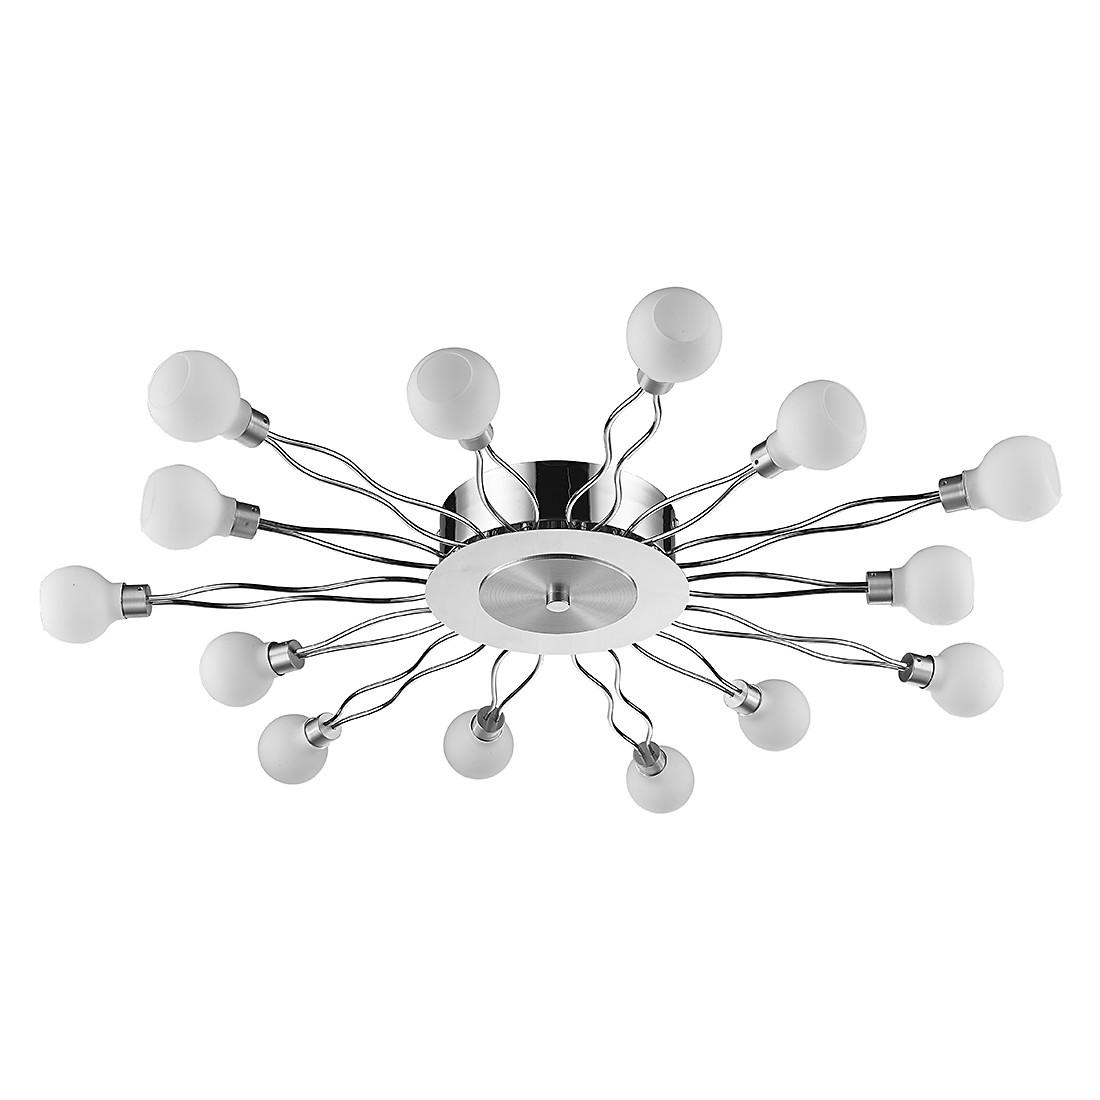 EEK A+, LED Deckenleuchte Doppia – Metall/Glas – 14-flammig, Sorpetaler jetzt bestellen